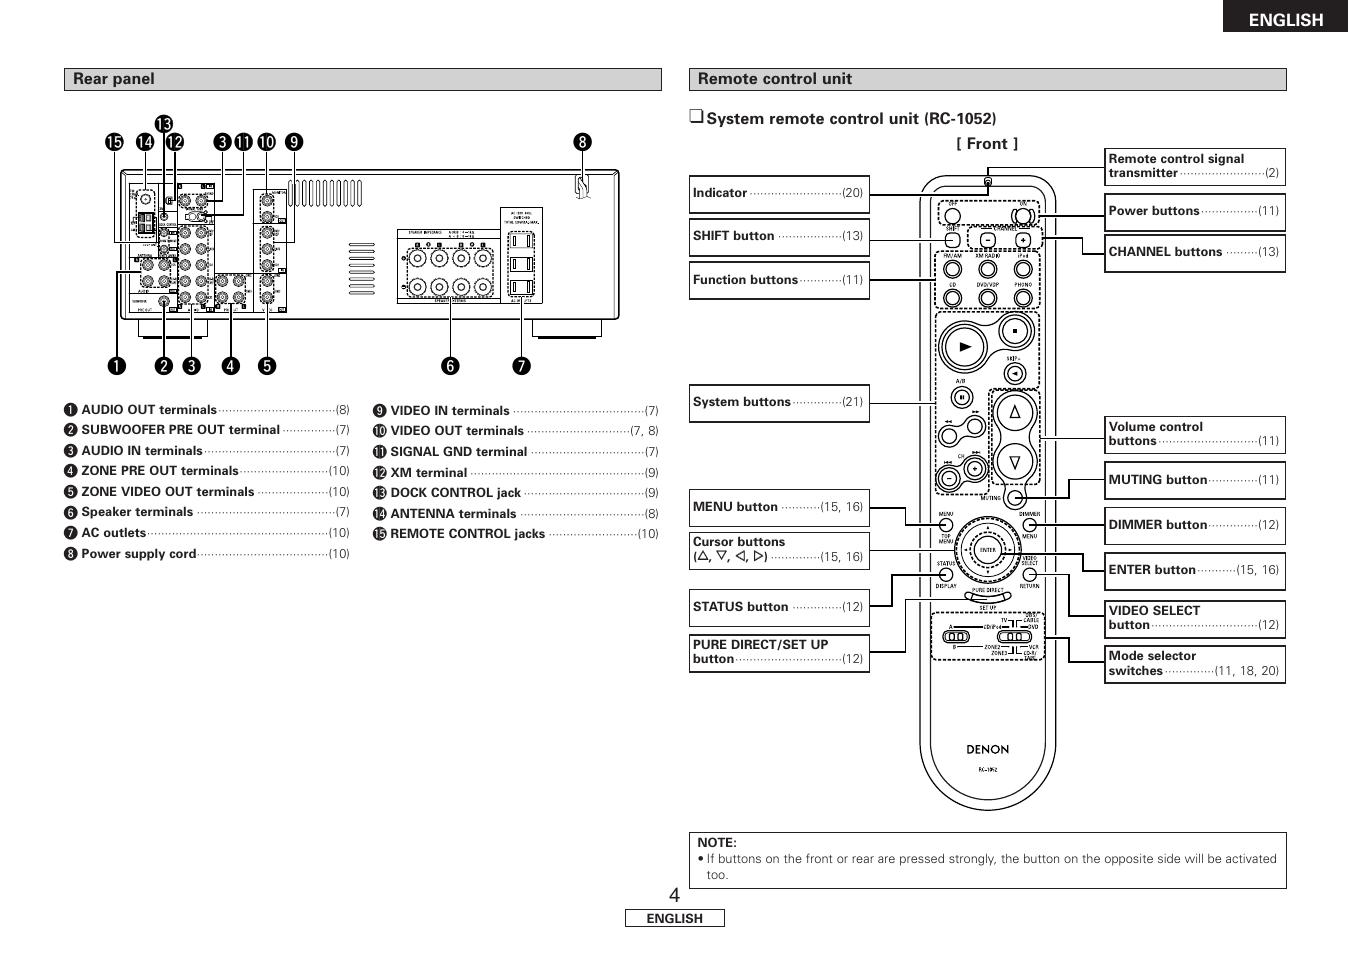 Denon Dra 397 User Manual